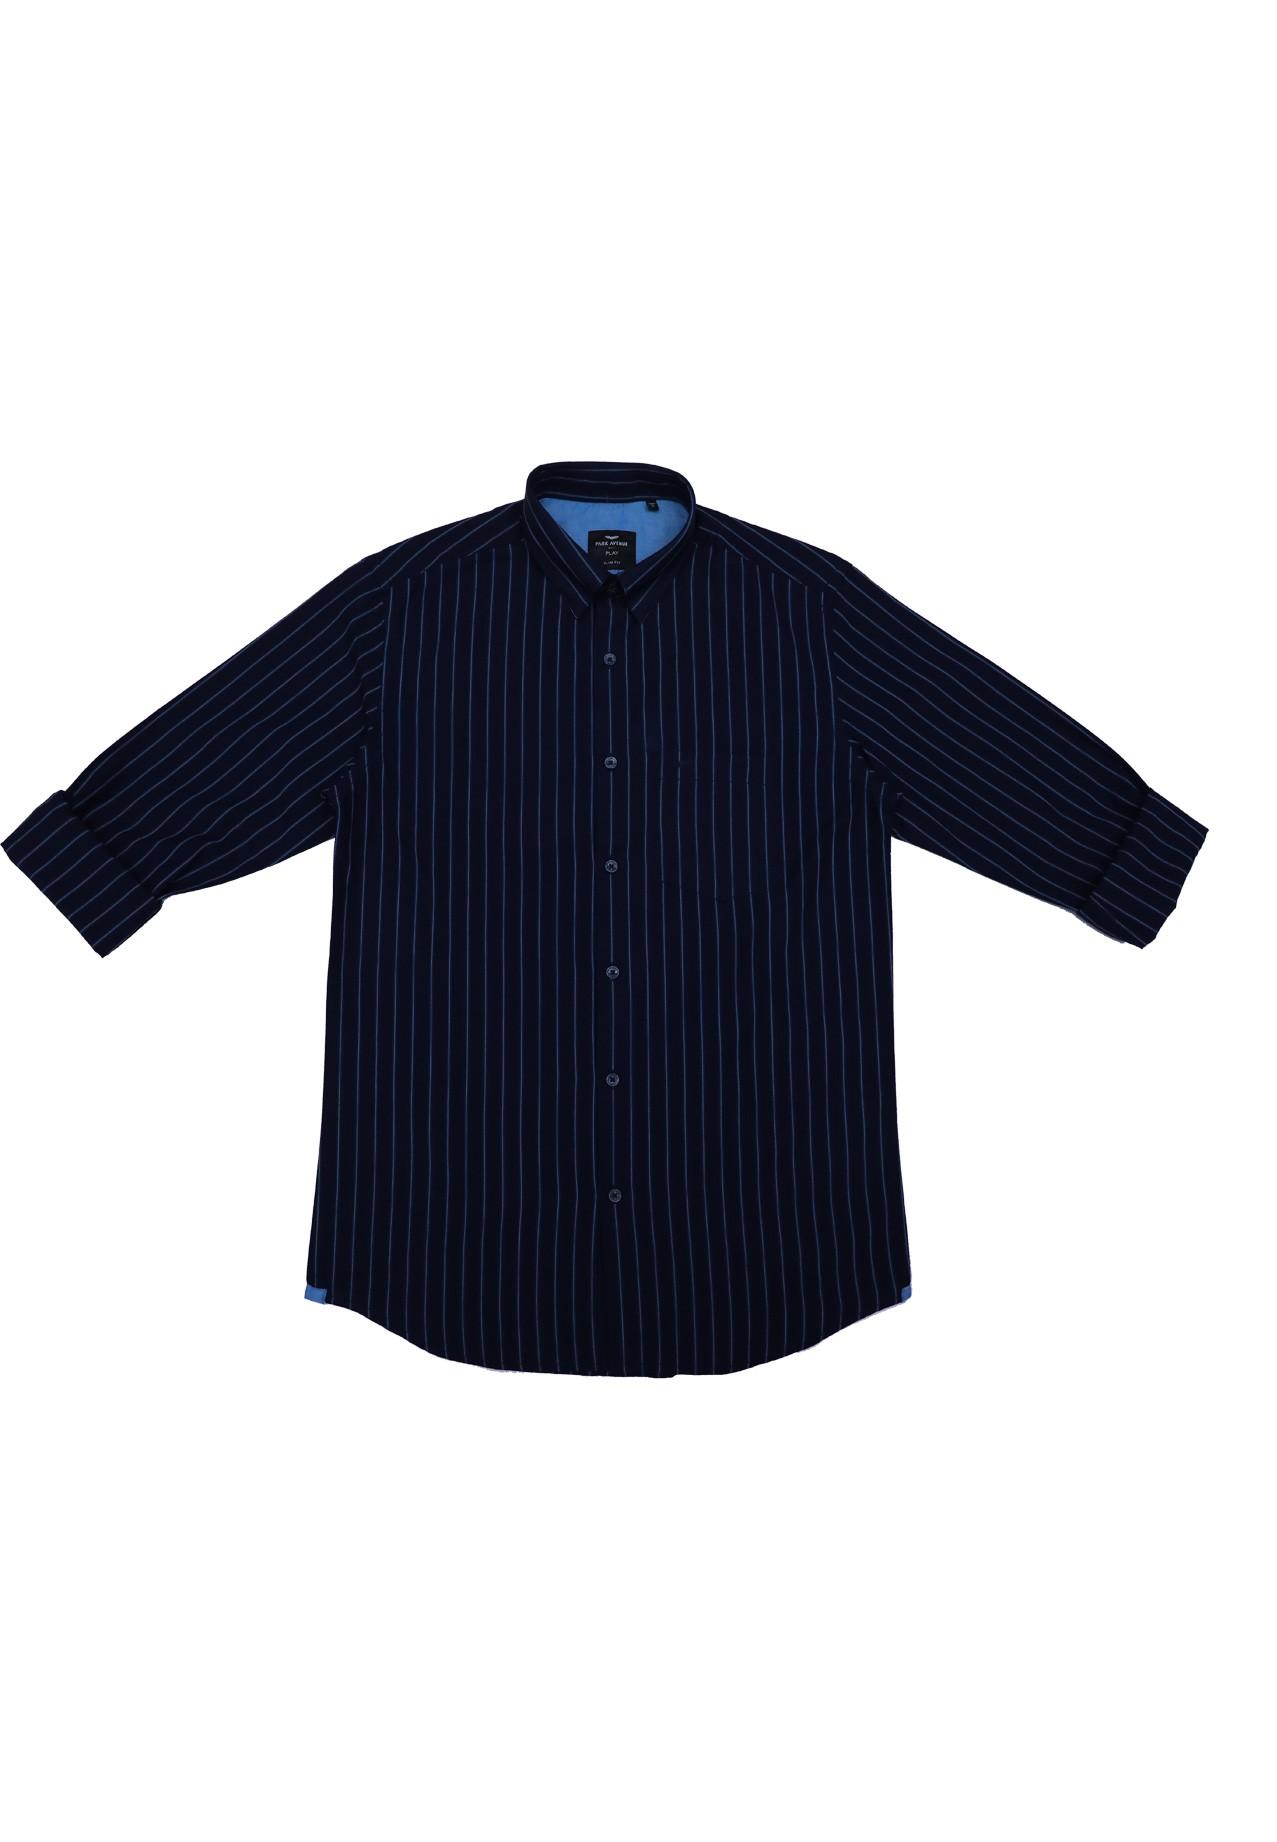 Park Avenue PCSA01884-B7 Mens Shirt, Size 42